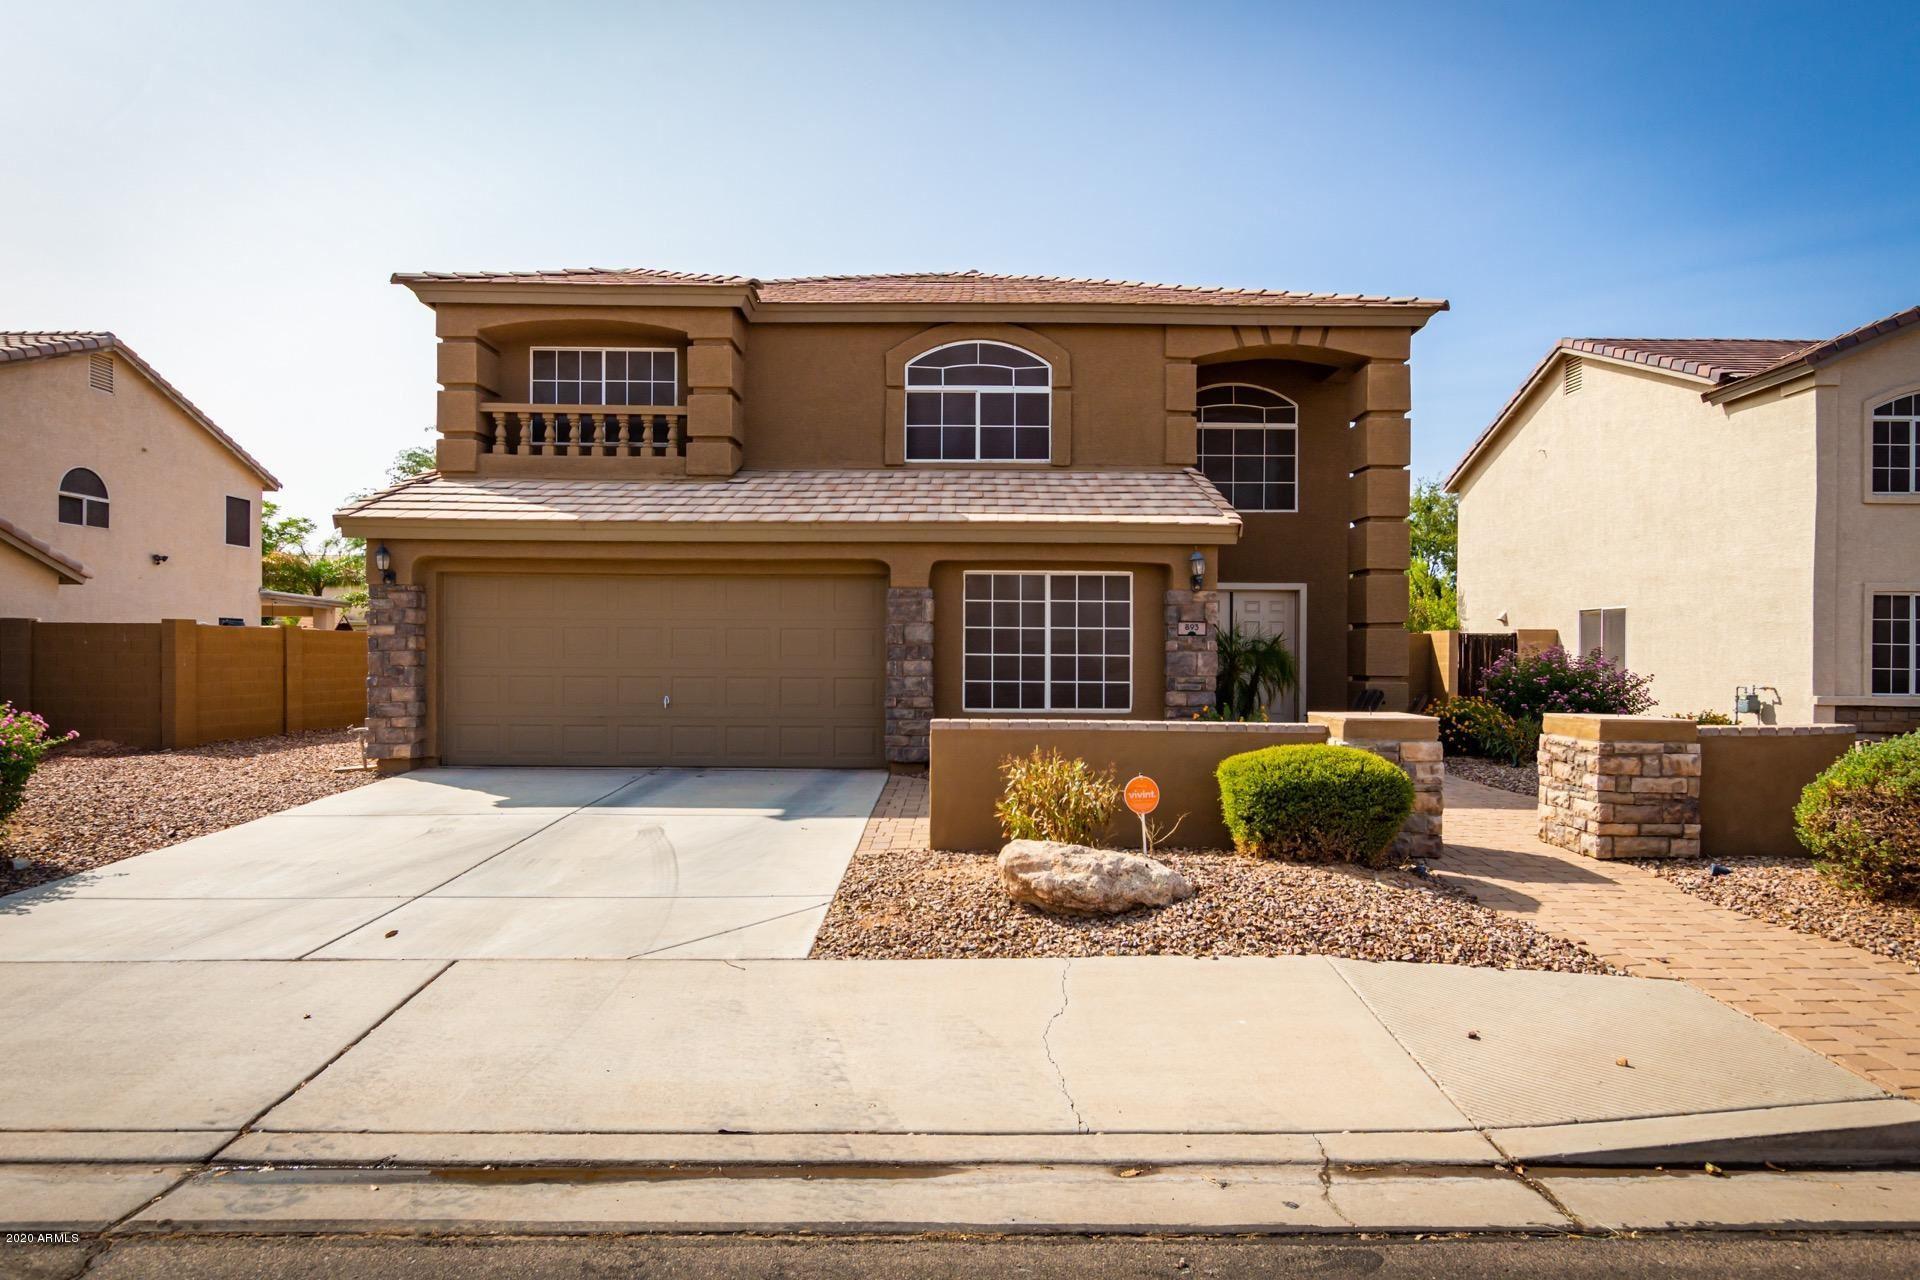 893 E ROSEBUD Drive, San Tan Valley, AZ 85143 - MLS#: 6133968